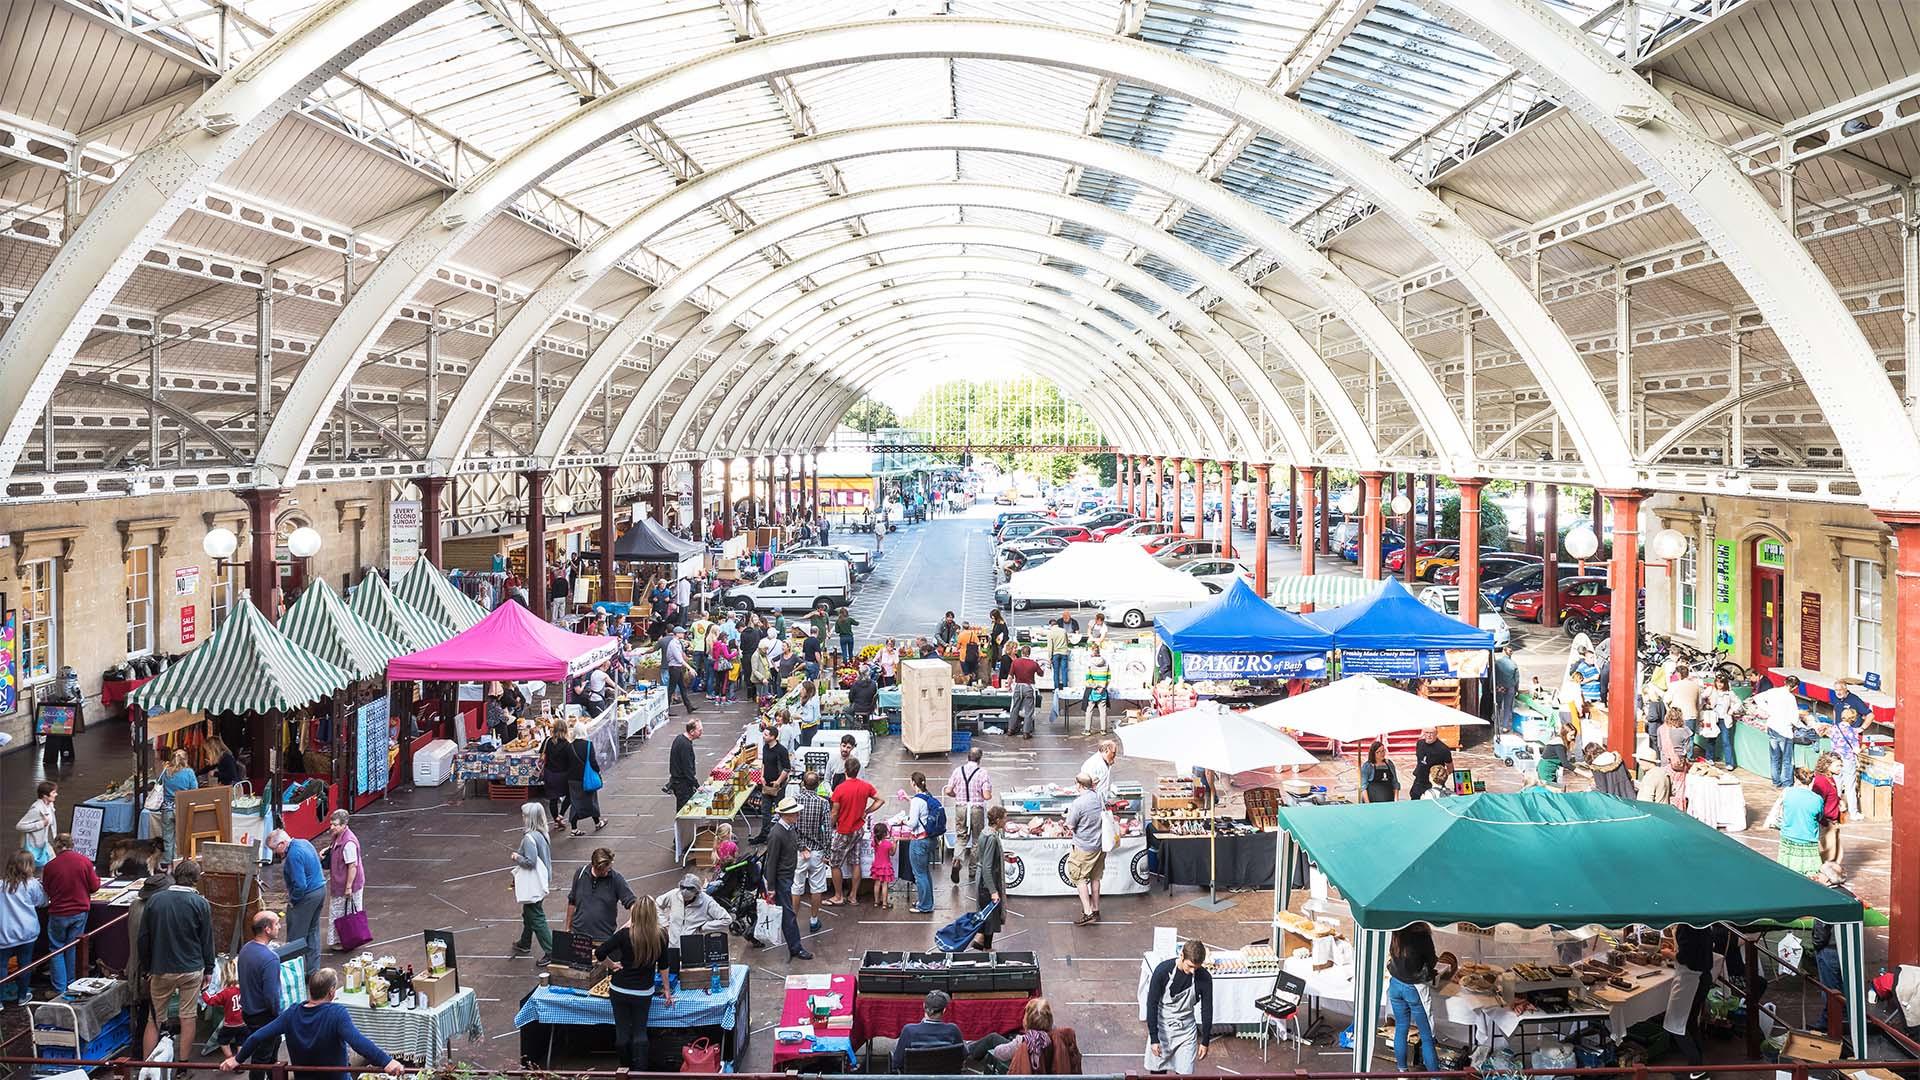 Green Park Station market, Bath Spa